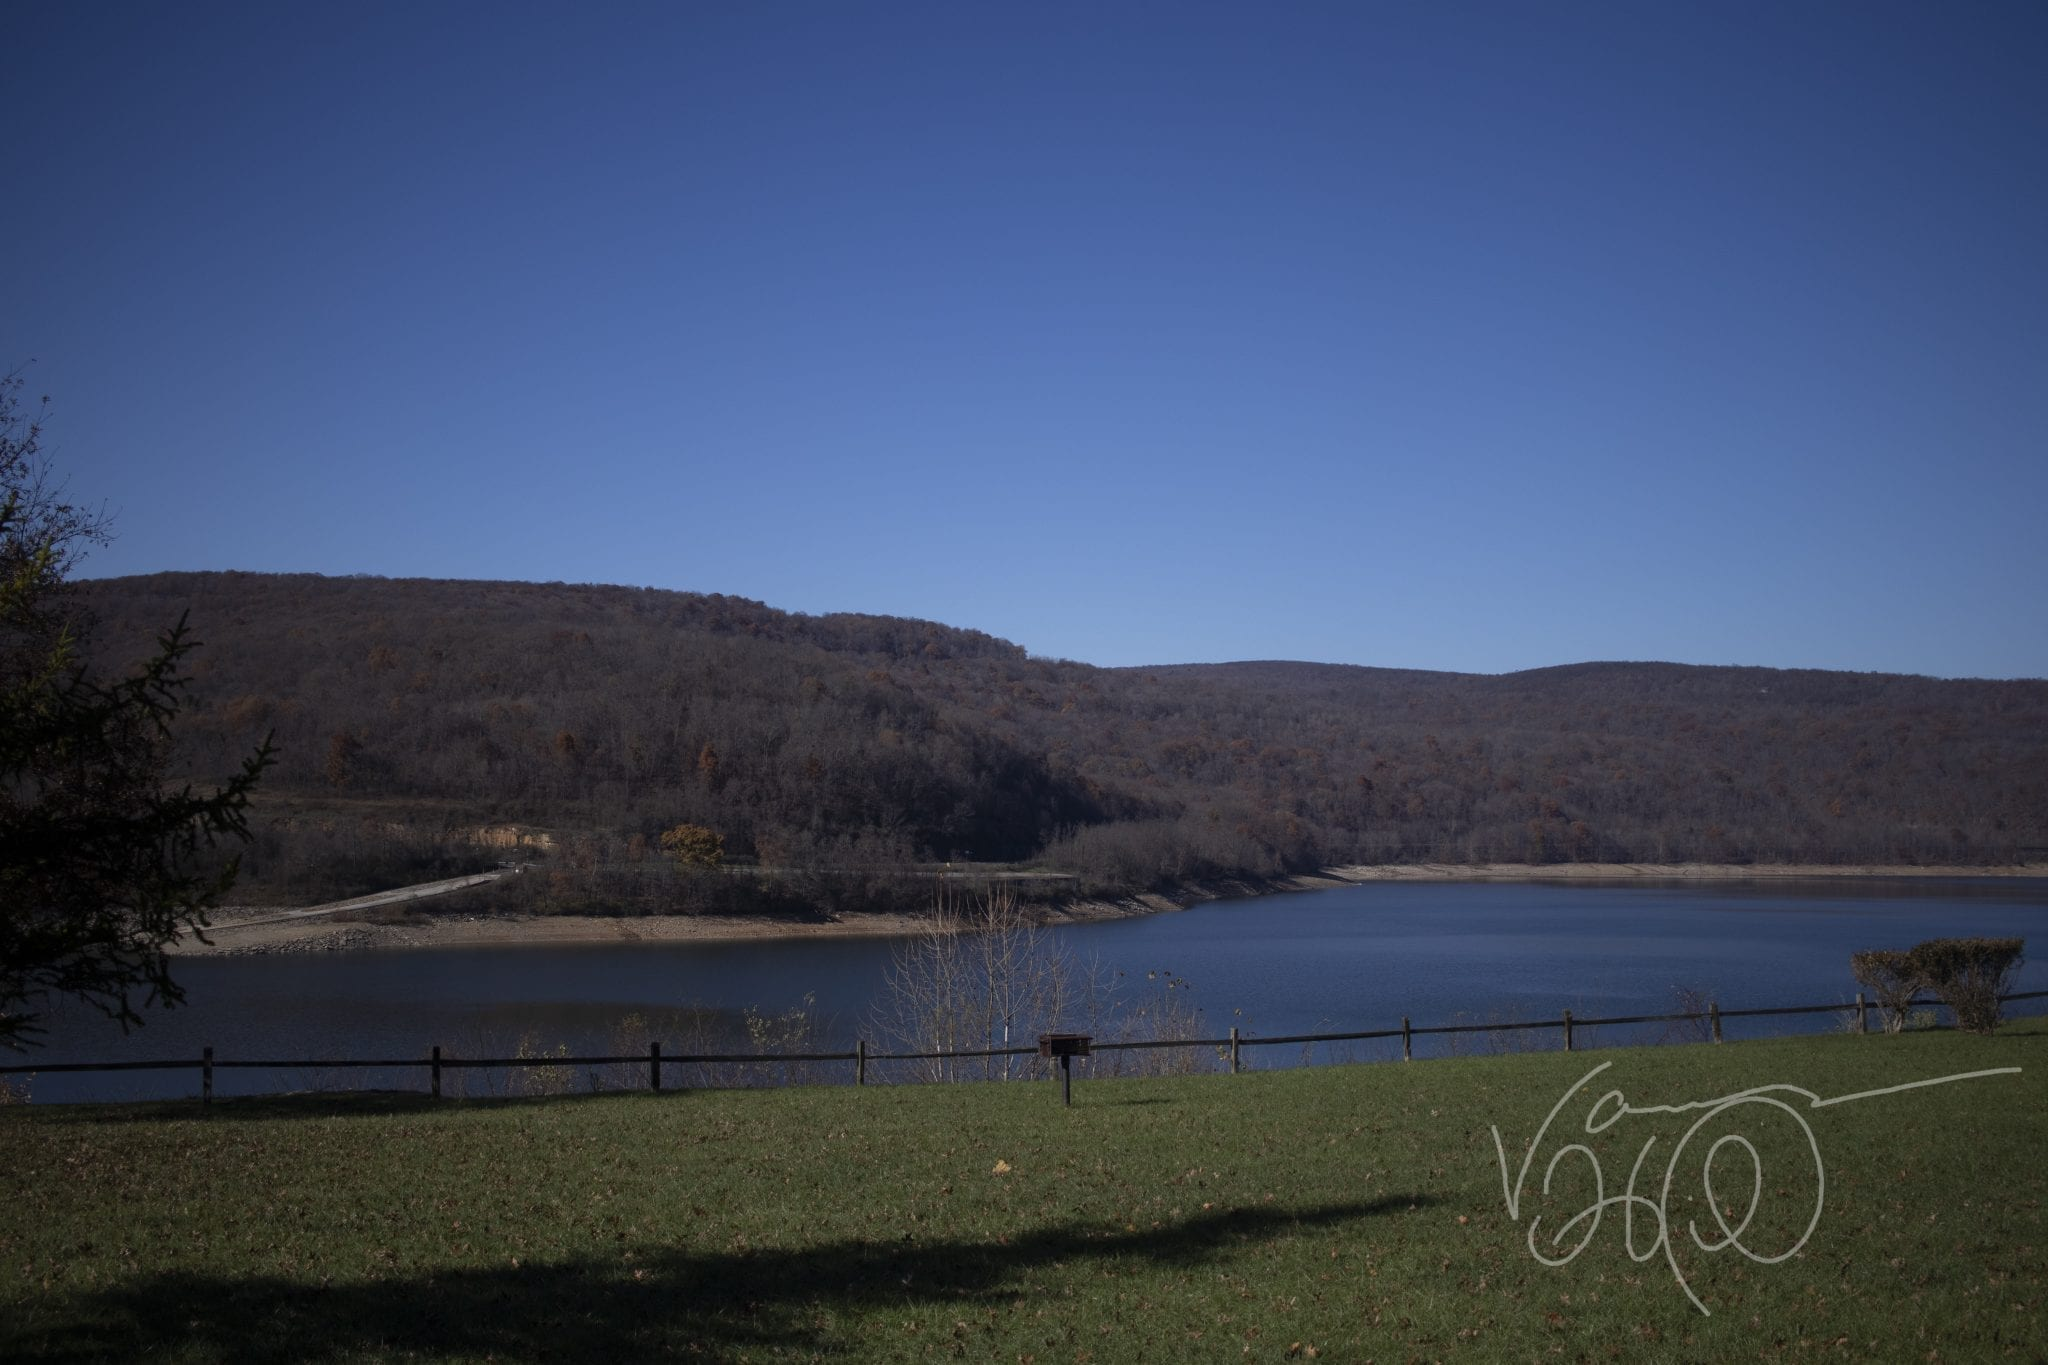 Charcoal Pit at Jennings Randolph Lake North Branch Potomac River in late fall